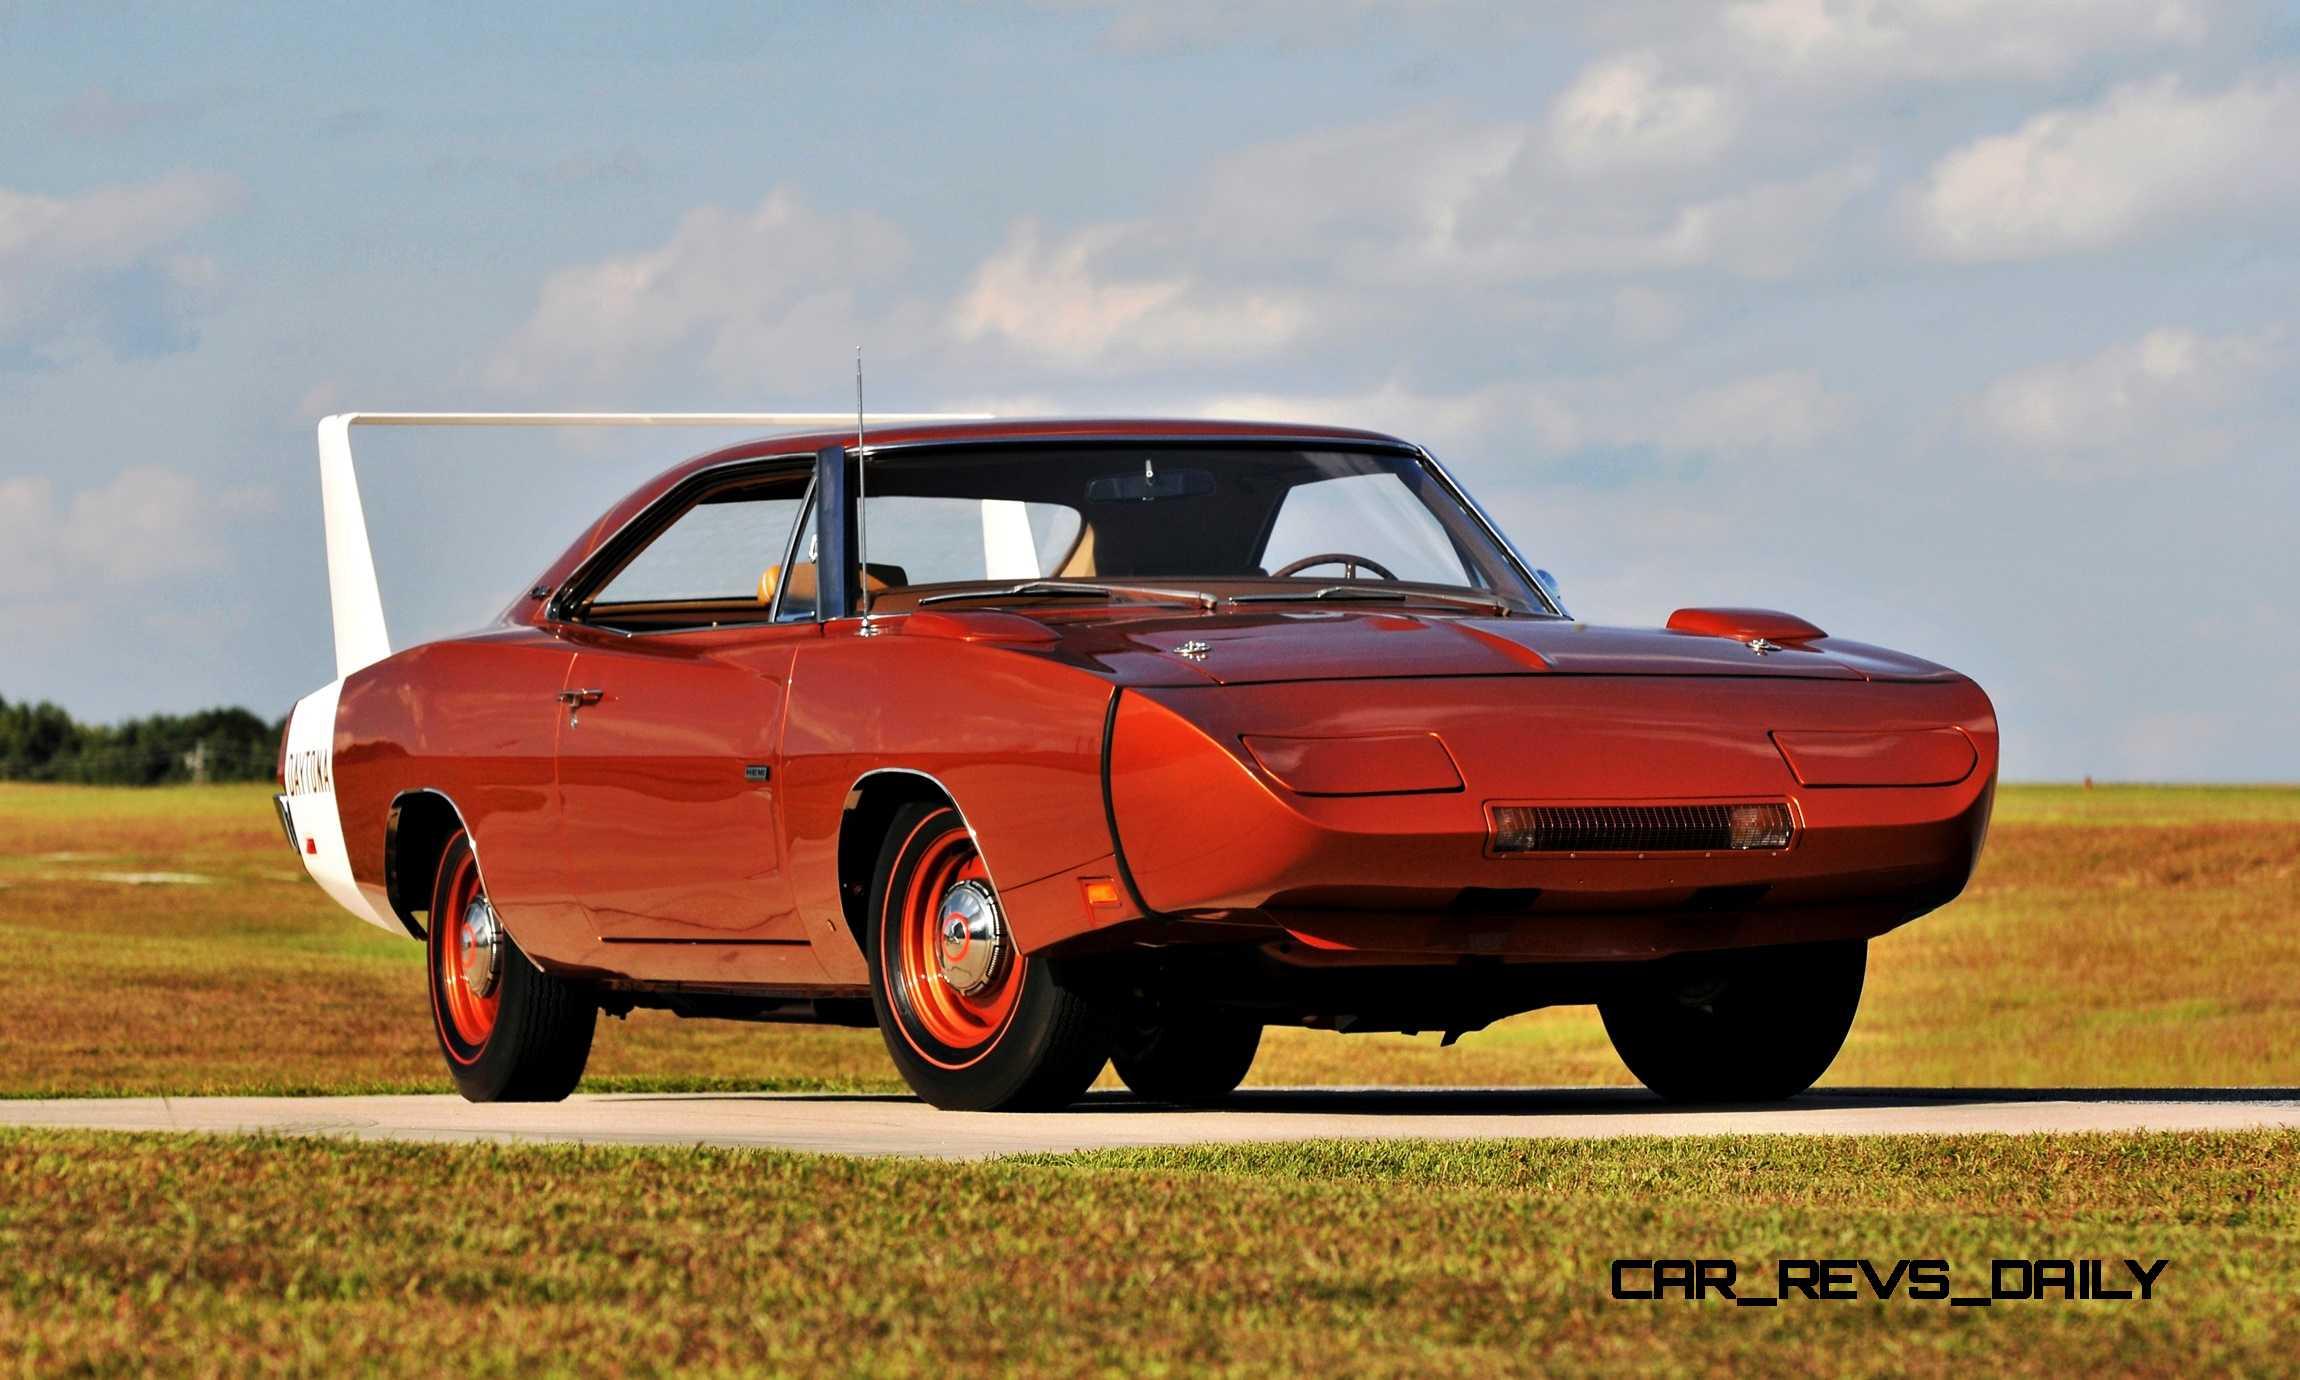 Mecum Florida 2015 Hero – 1969 Dodge Charger Hemi DAYTONA Brings $900k1969 Dodge Charger Hemi DAYTONALot R218// Kissimmee 2015 //Jan 16-251969 Dodge Hemi Daytona 426/425 HP, 4-Speed, 6,400 Miles